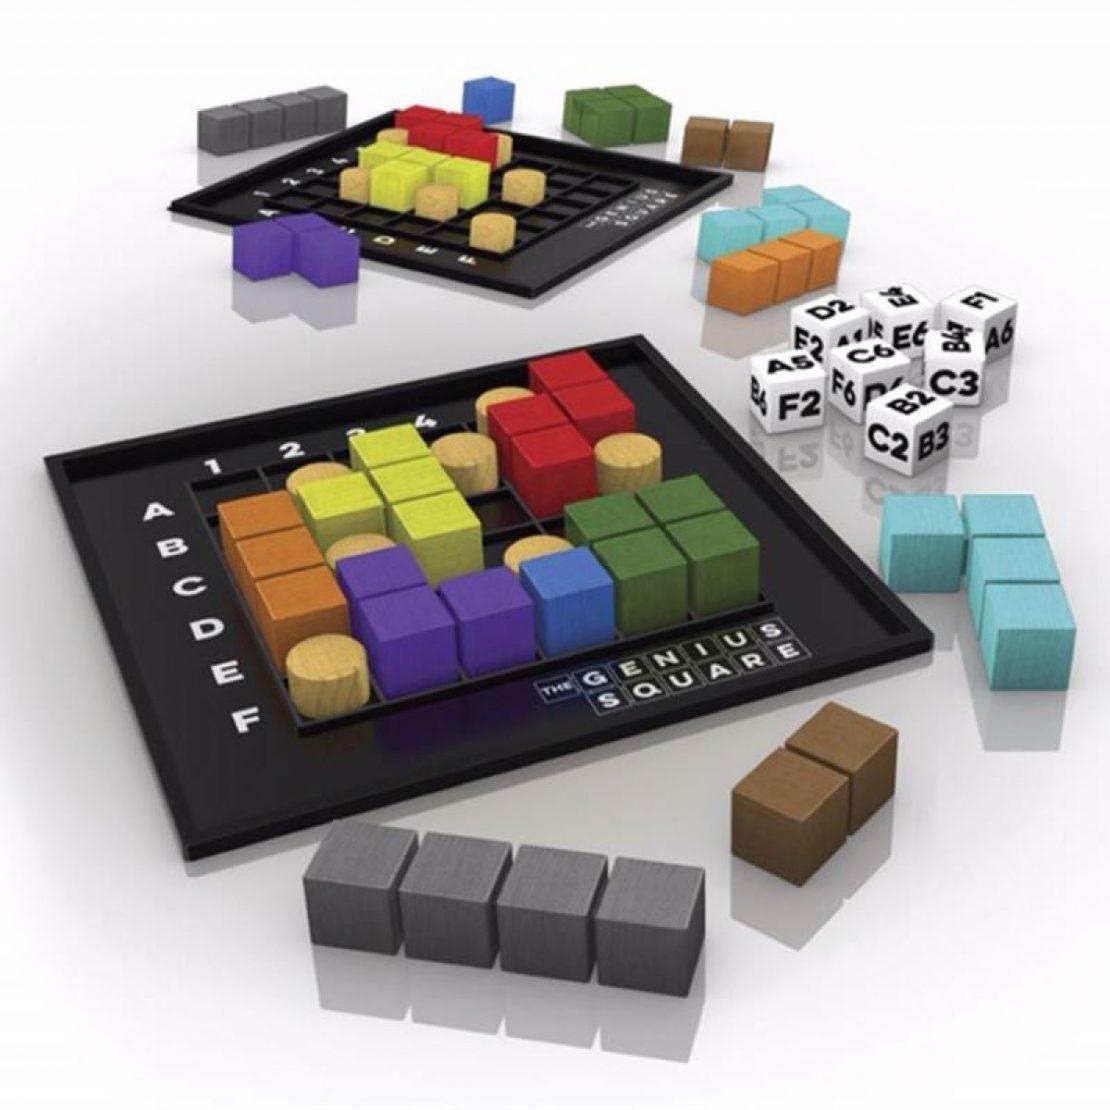 Genius Square Logic Game from Mukikim